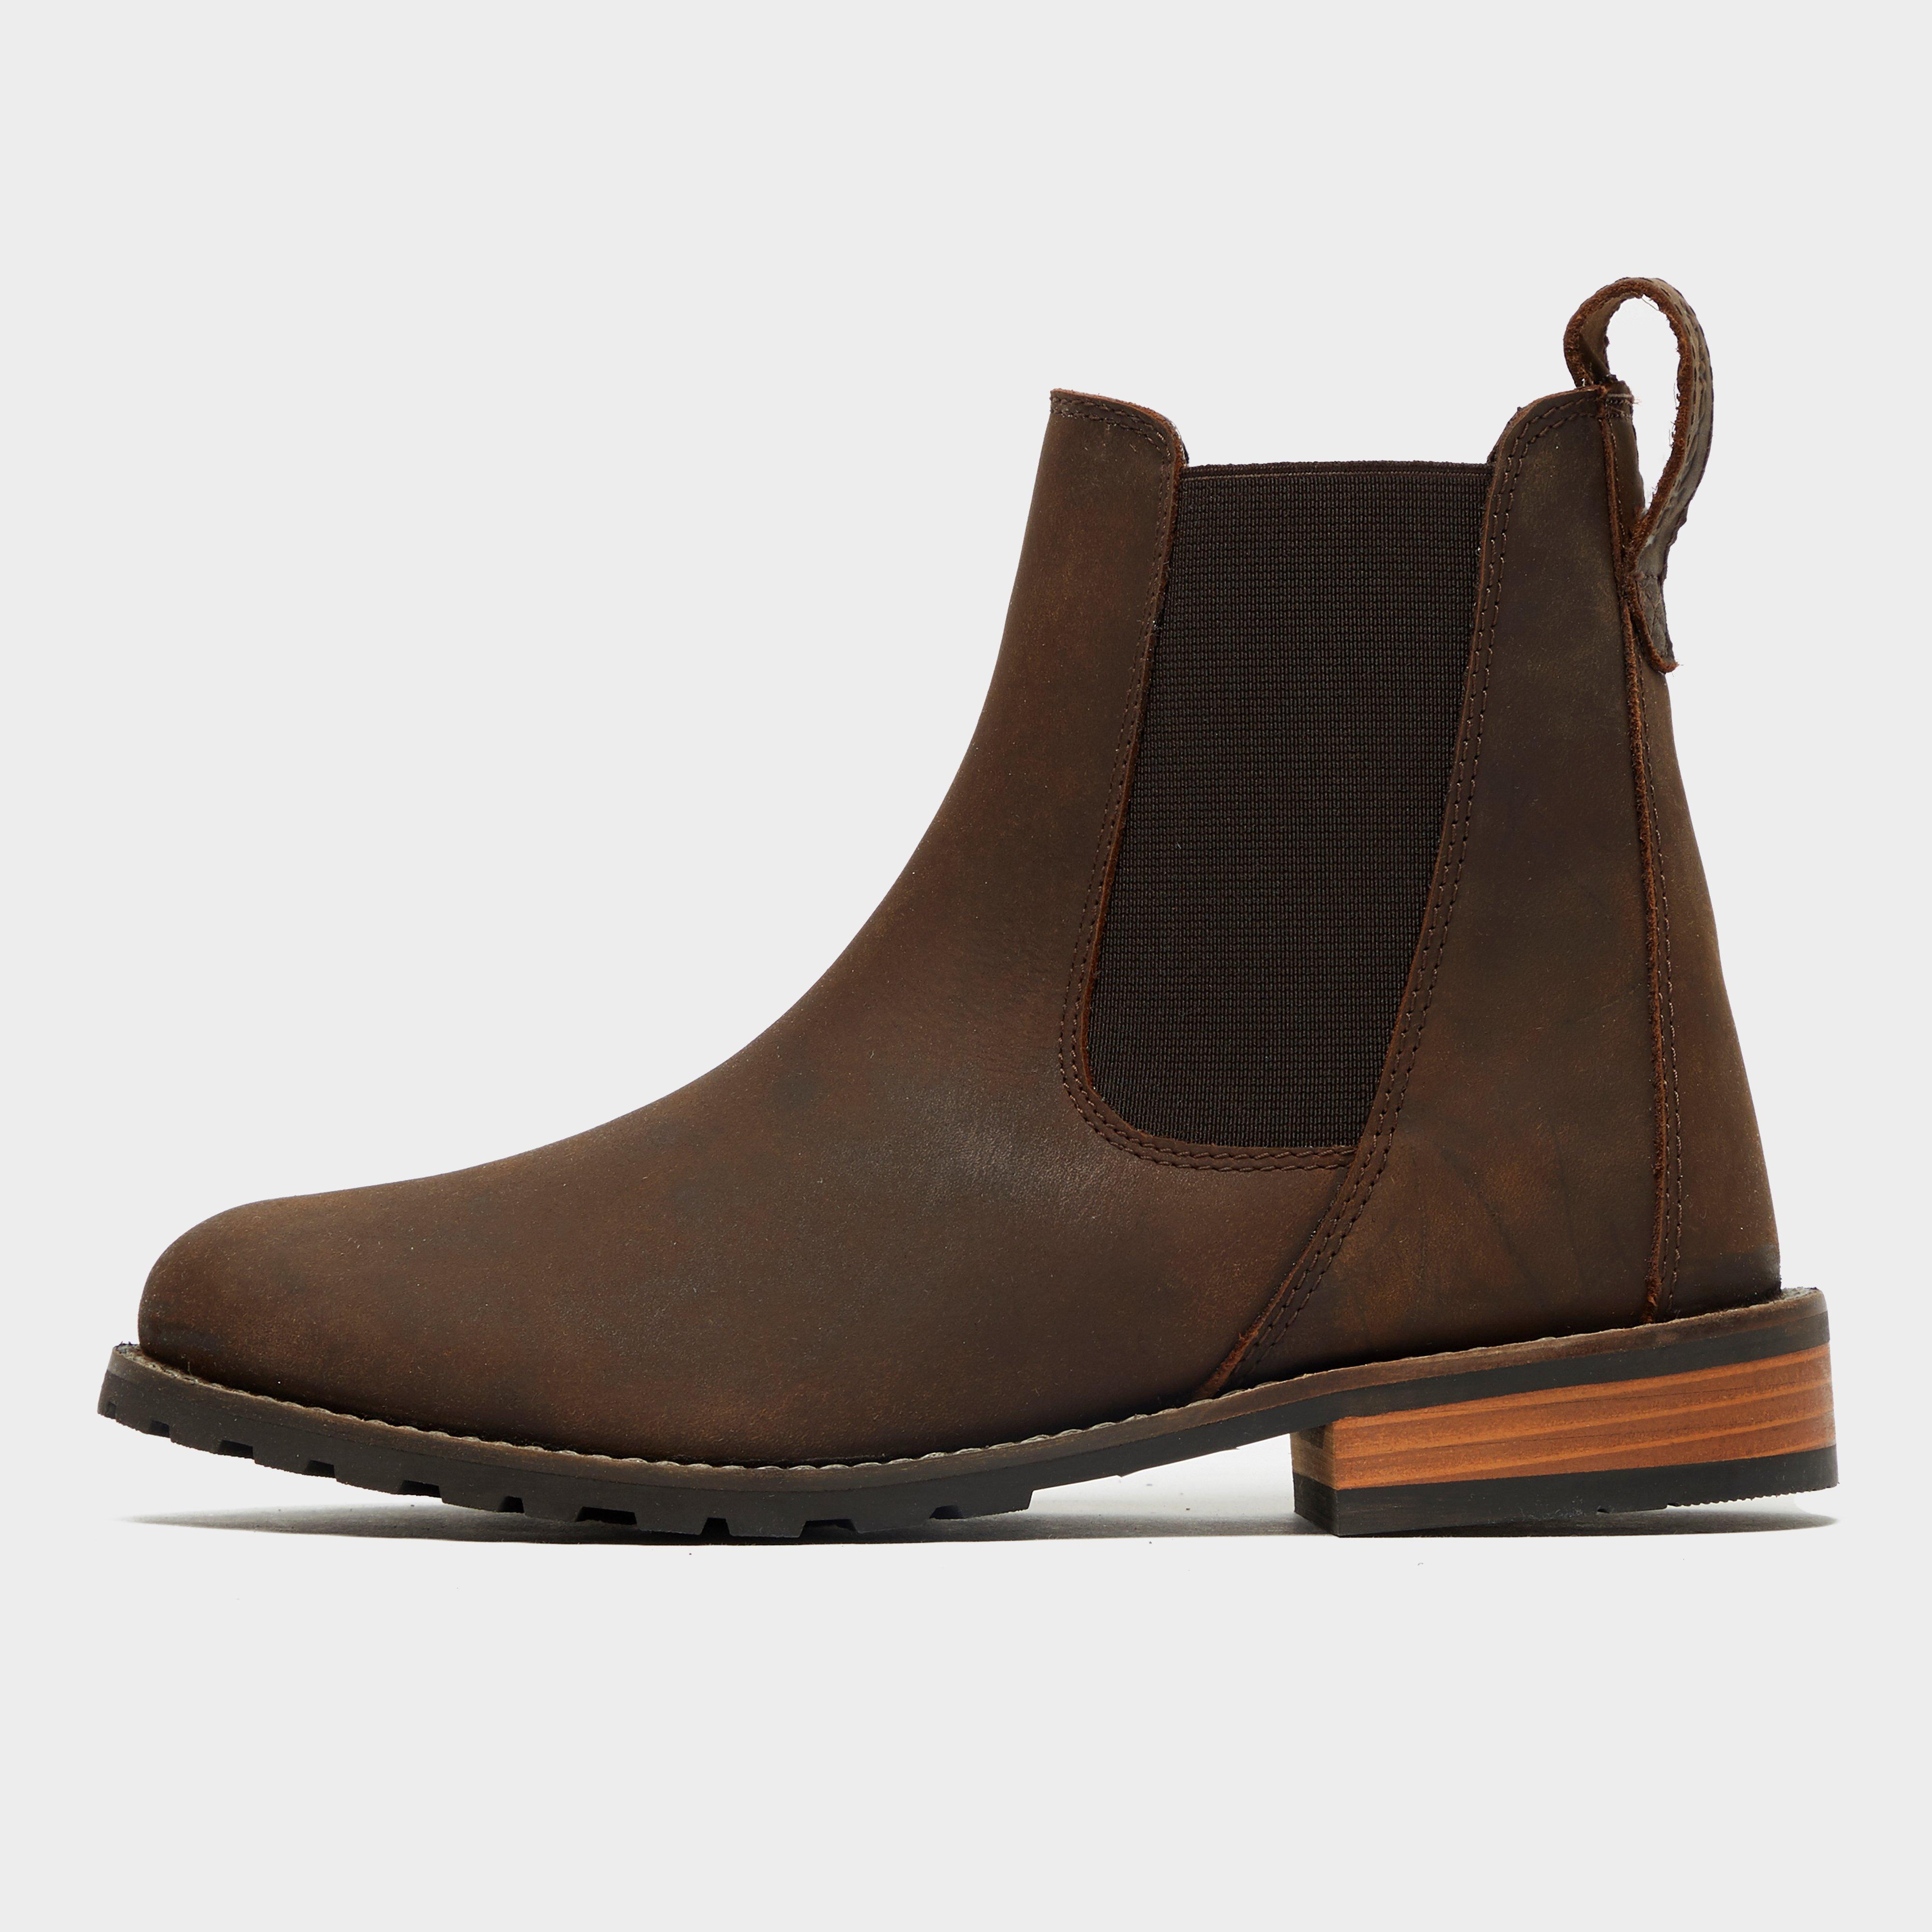 Brogini Women's Richmond Boots - Brown/Boots, Brown